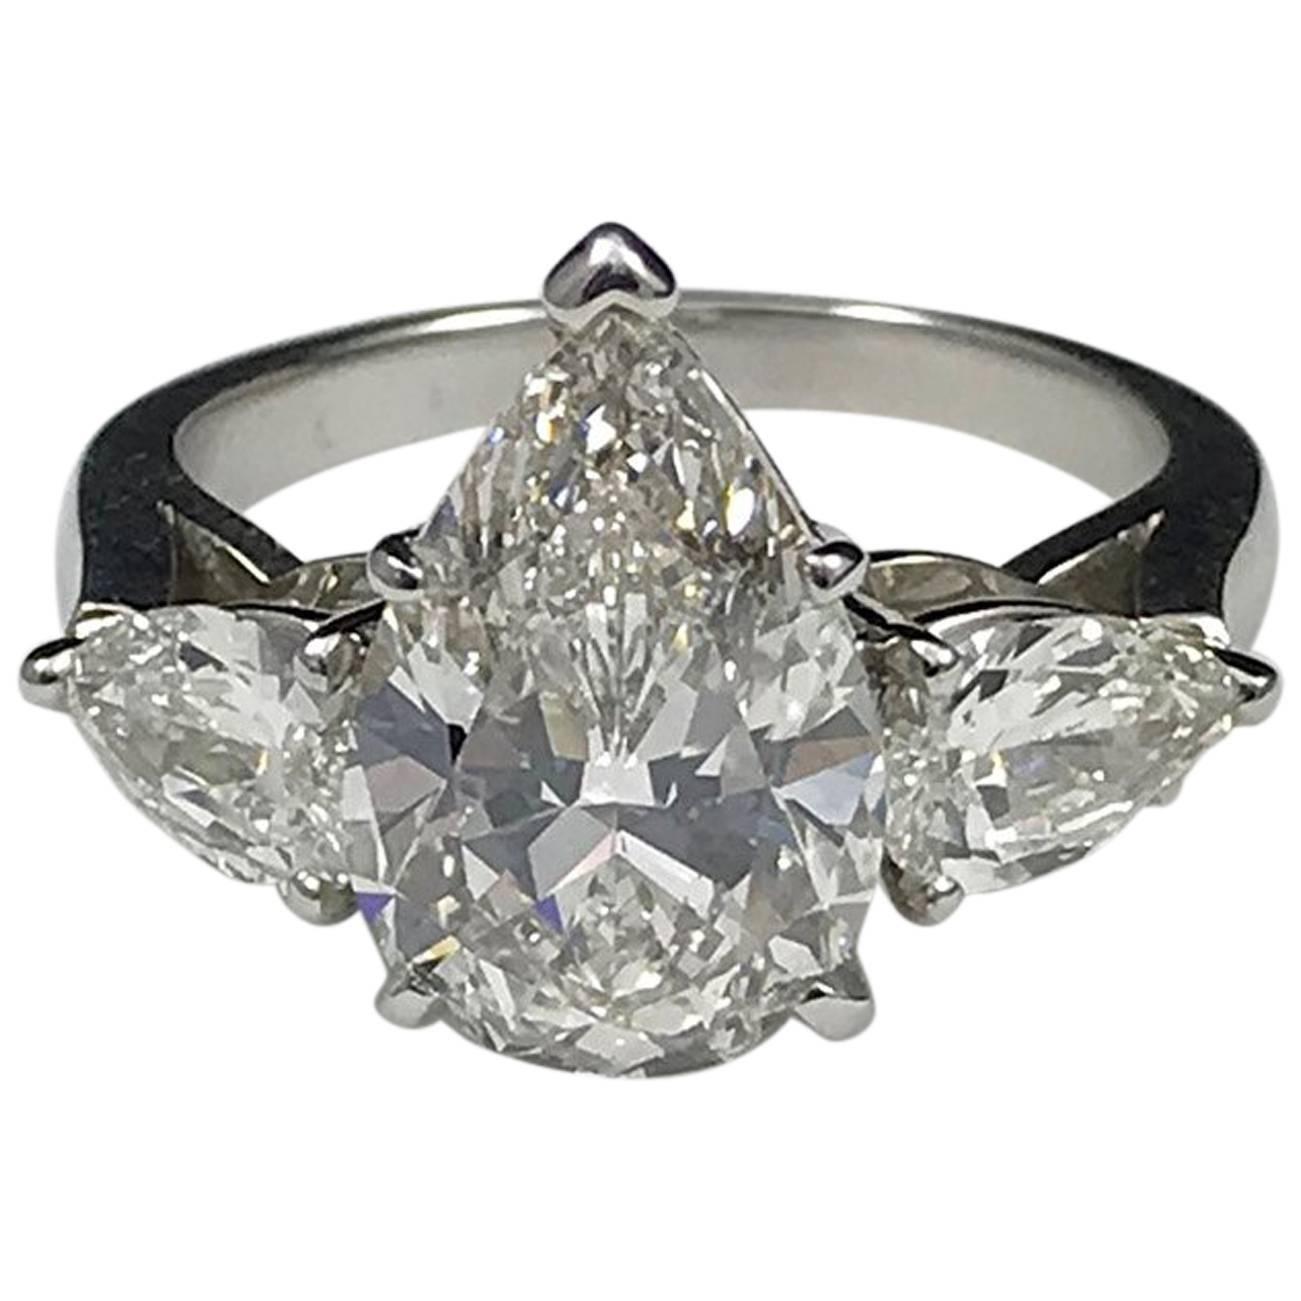 GIA Certified 4.03 Carat G VS1 J. Birnbach Pear Shaped Diamond Ring